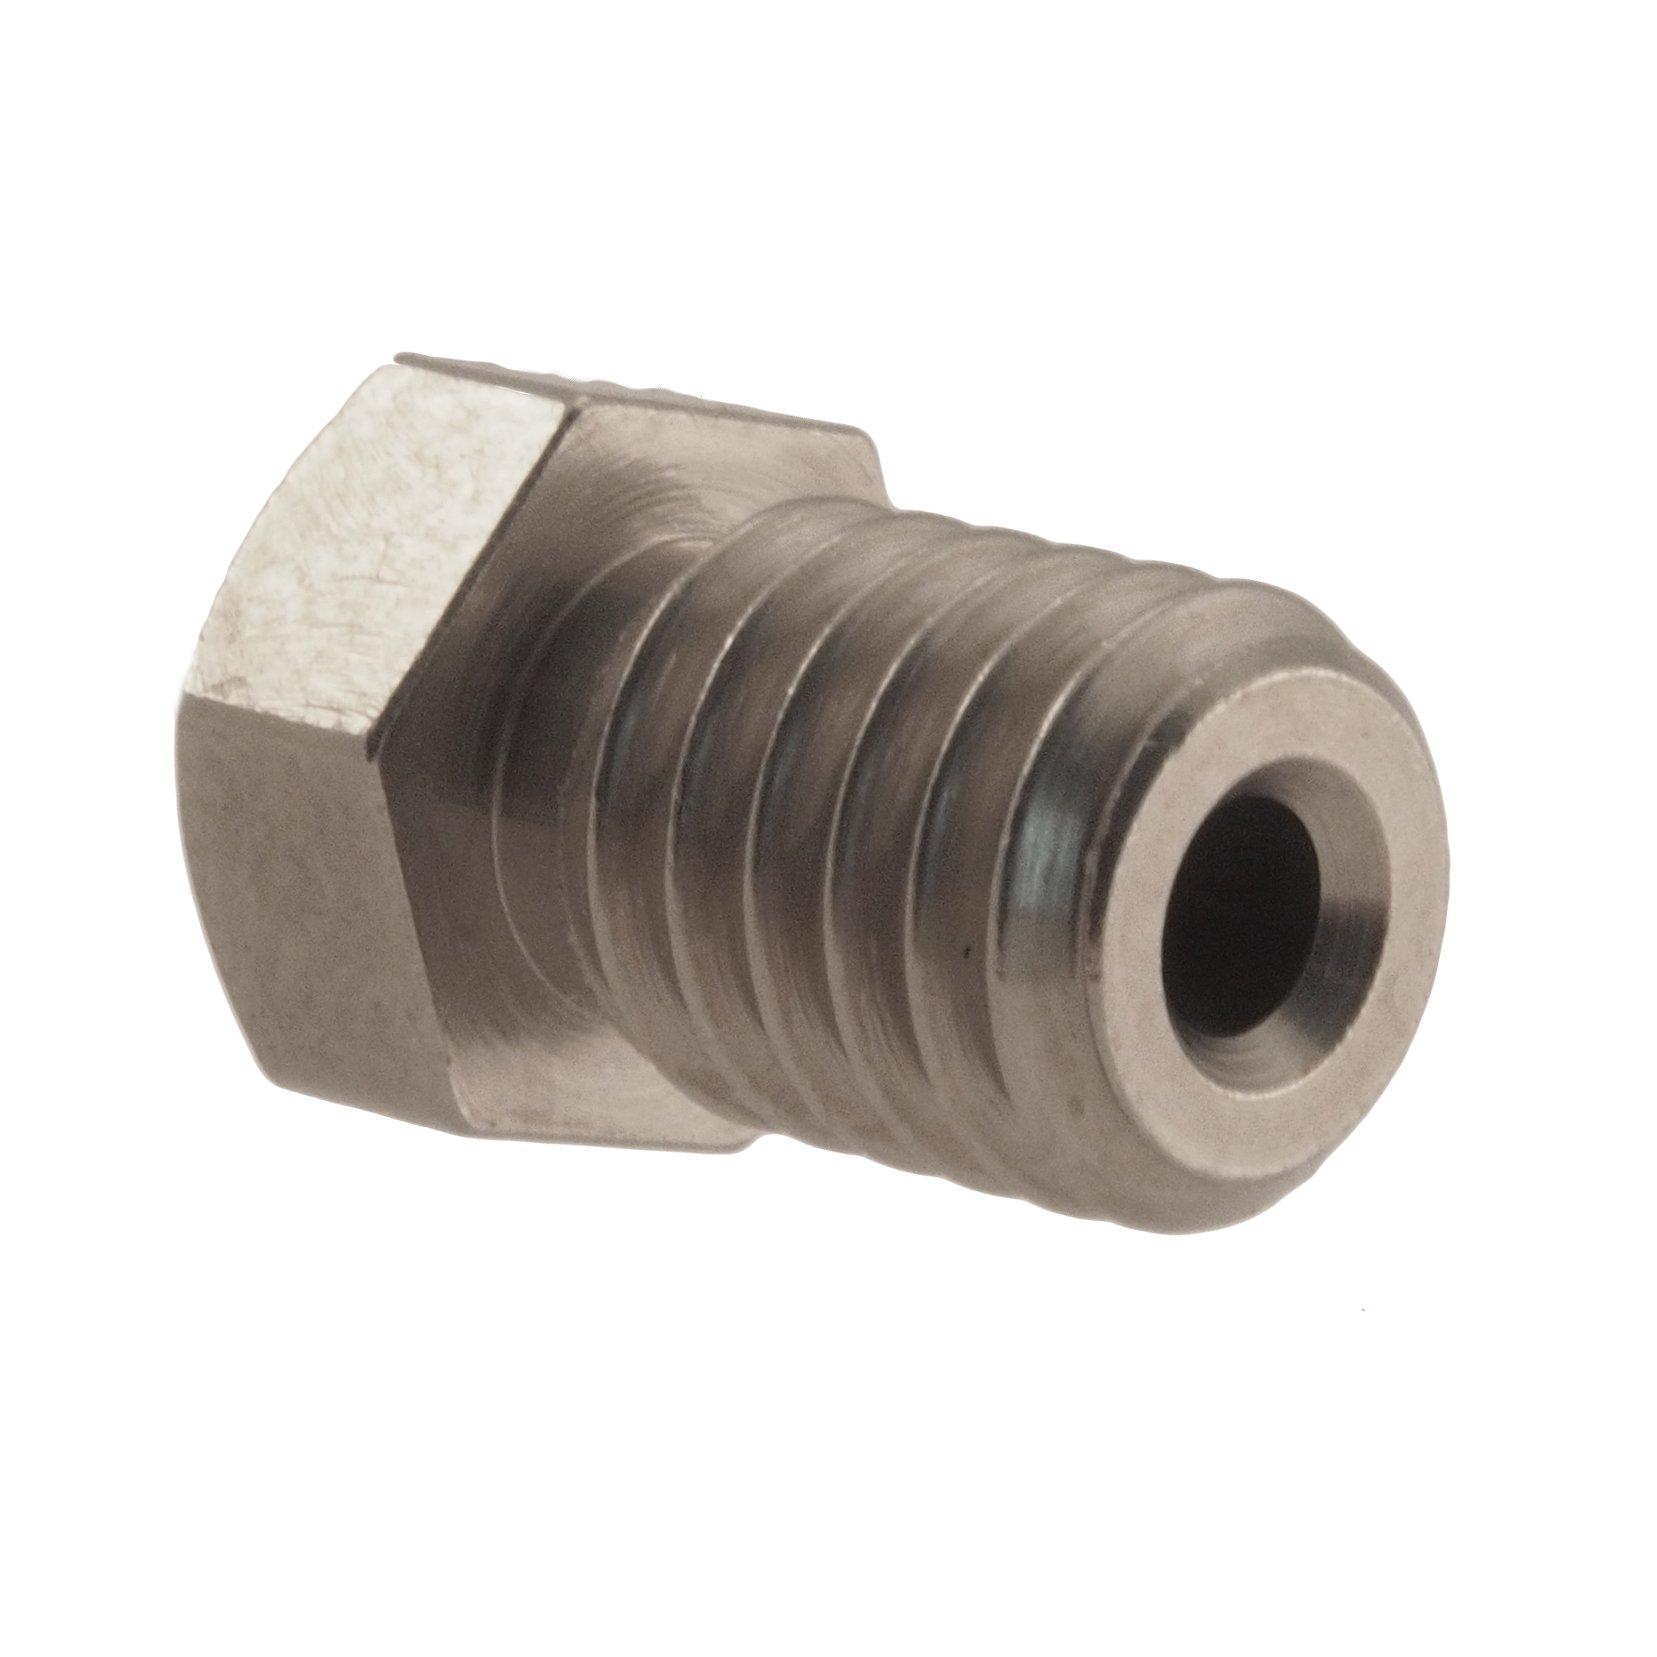 RepRap M6 0.4 mm Micro-Swiss HW-NOZ-MODMK8-04 Plated Brass Wear Resistant Nozzles E3D//Hexagon Bright Nickel 1.75 mm